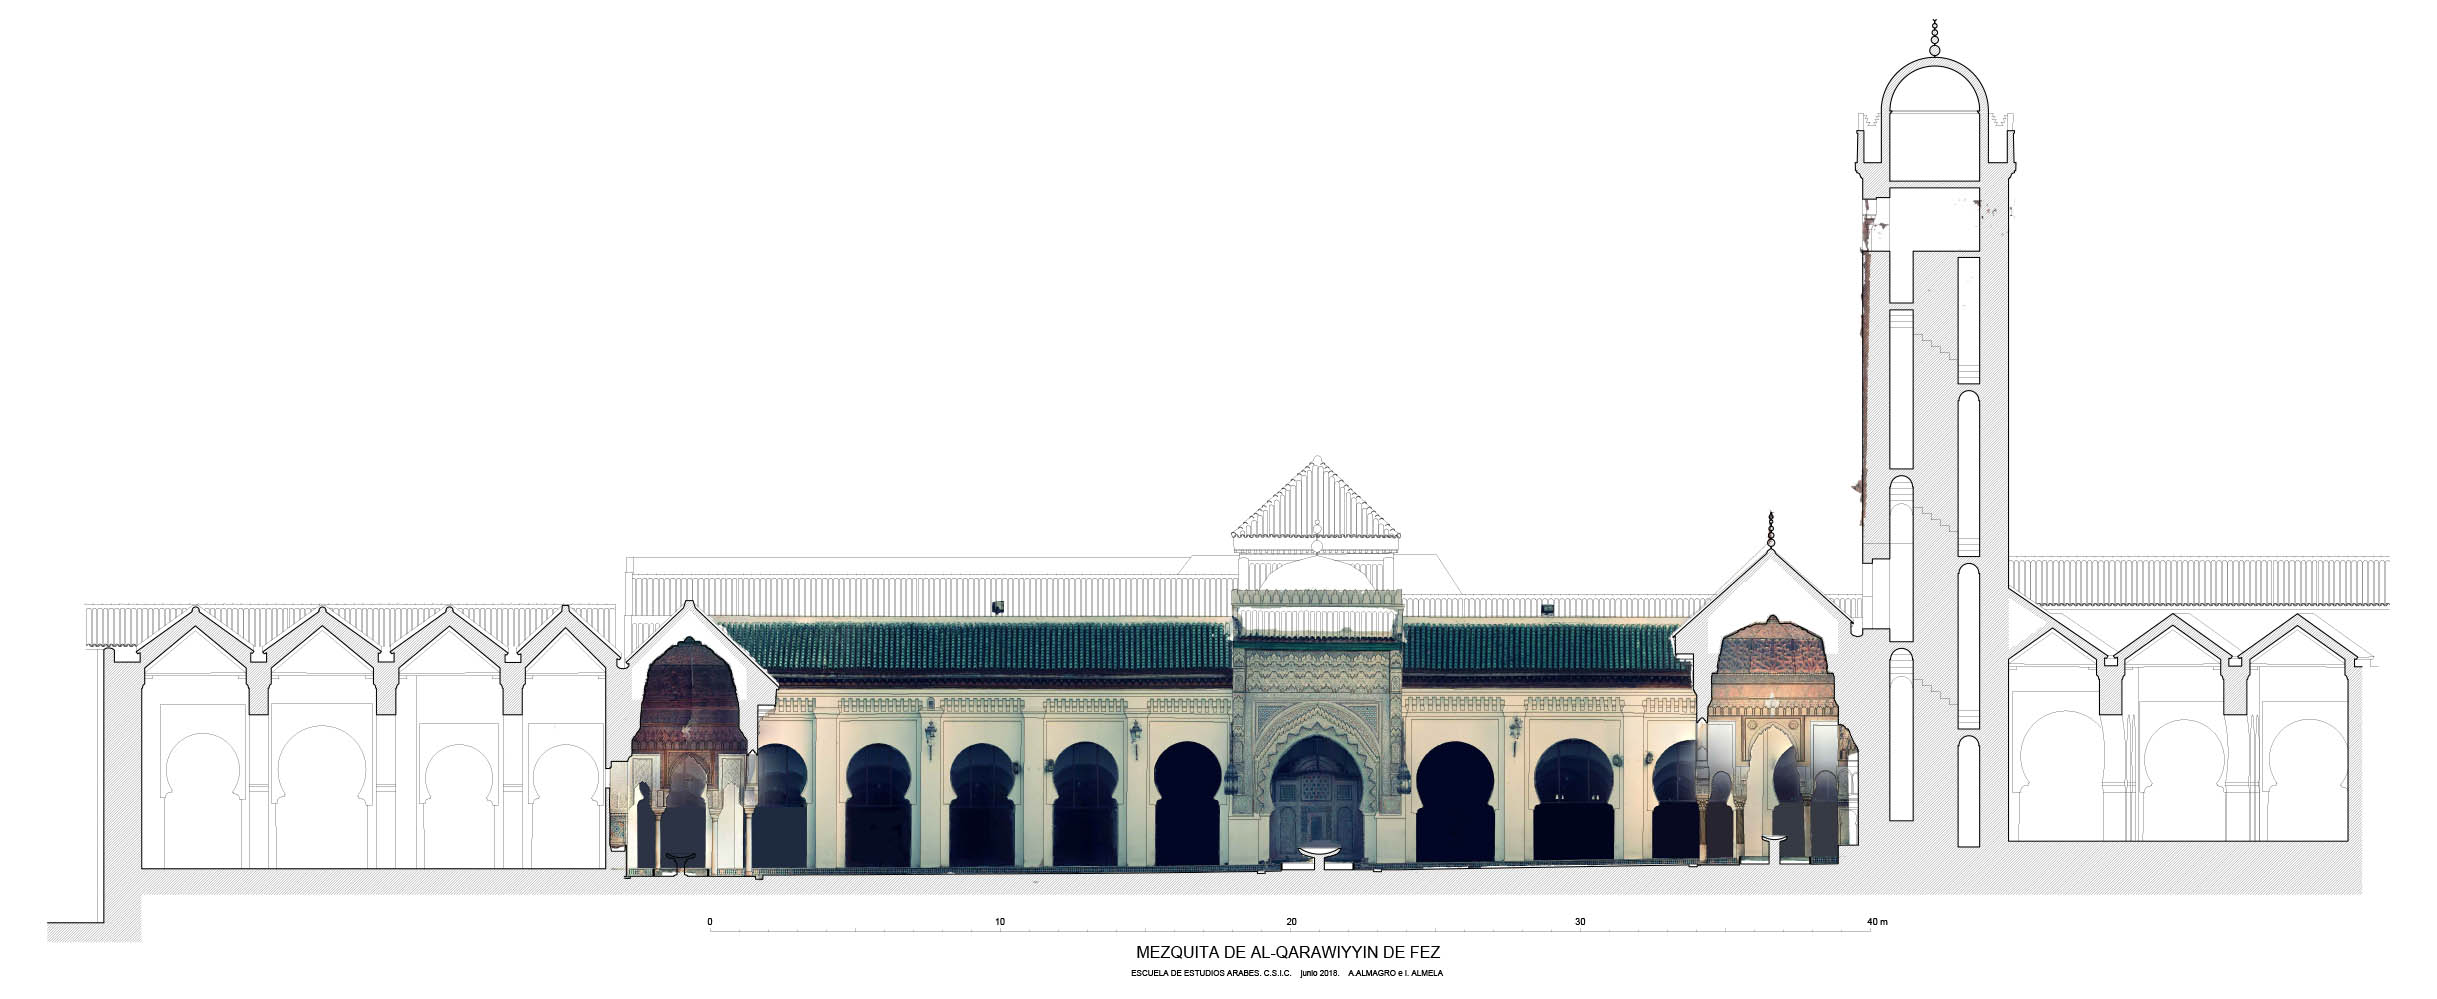 Mezquita Qarawiyyin (Fez, Marruecos) - Seccion Longitudinal con orto